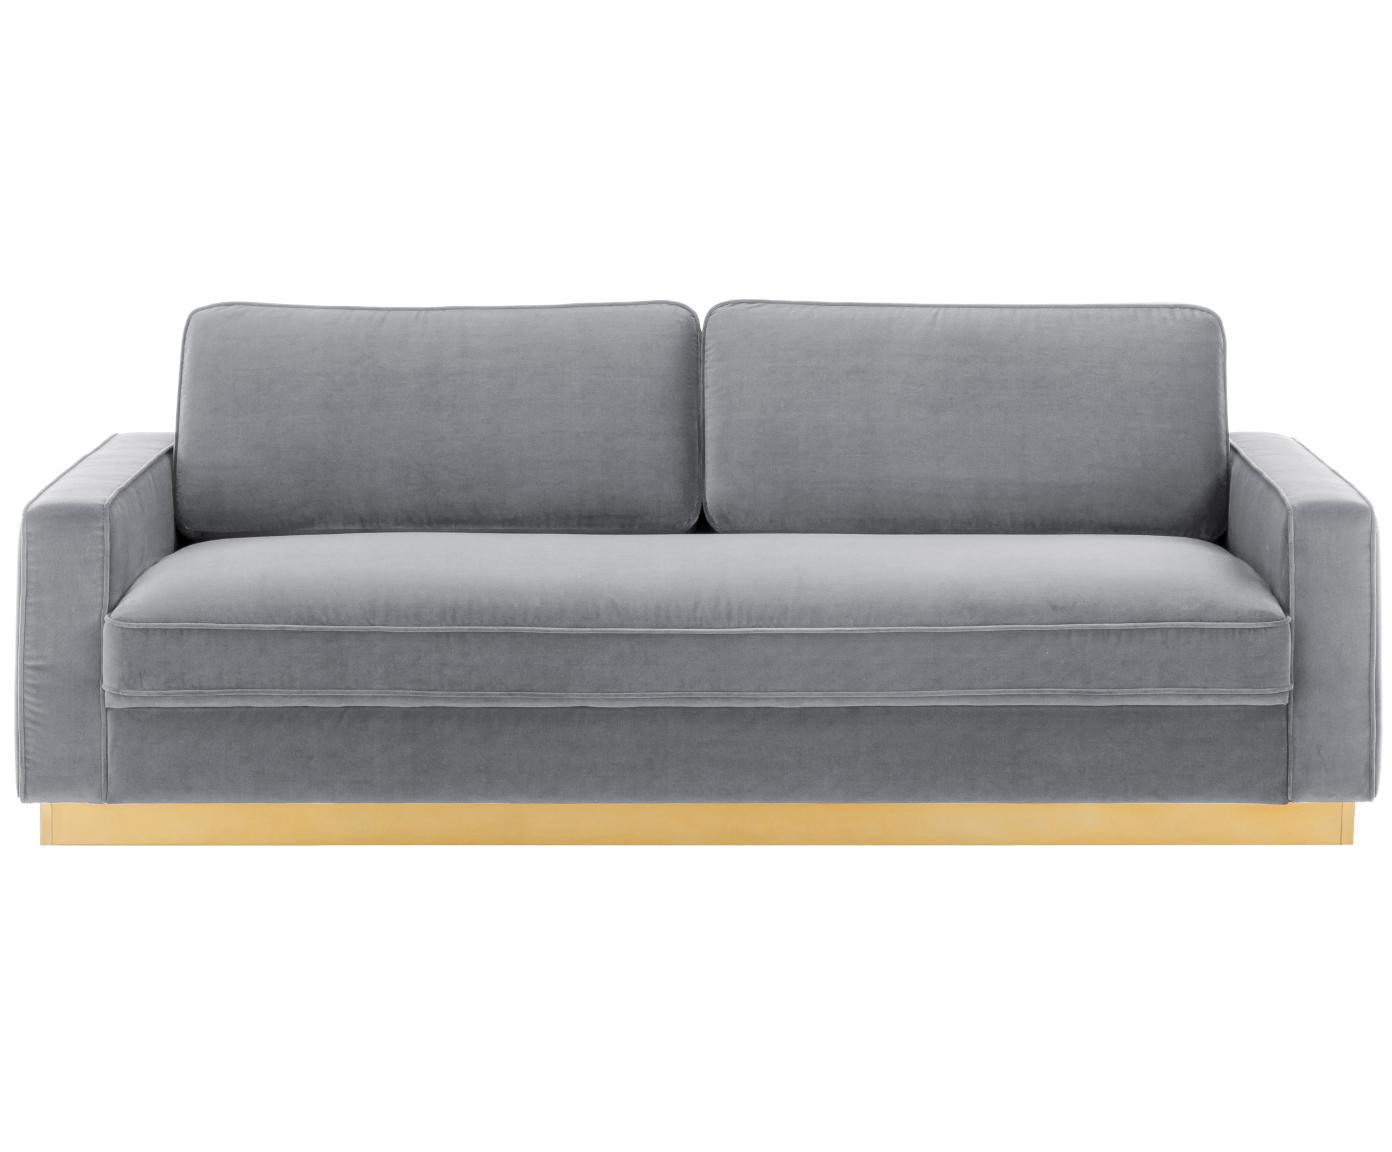 Samt-Sofa Chelsea (3-Sitzer), Bezug: Samt (Hochwertiger Polyes, Gestell: Massives Fichtenholz, Rahmen: Metall, beschichtet, Samt Grau, B 228 x T 100 cm